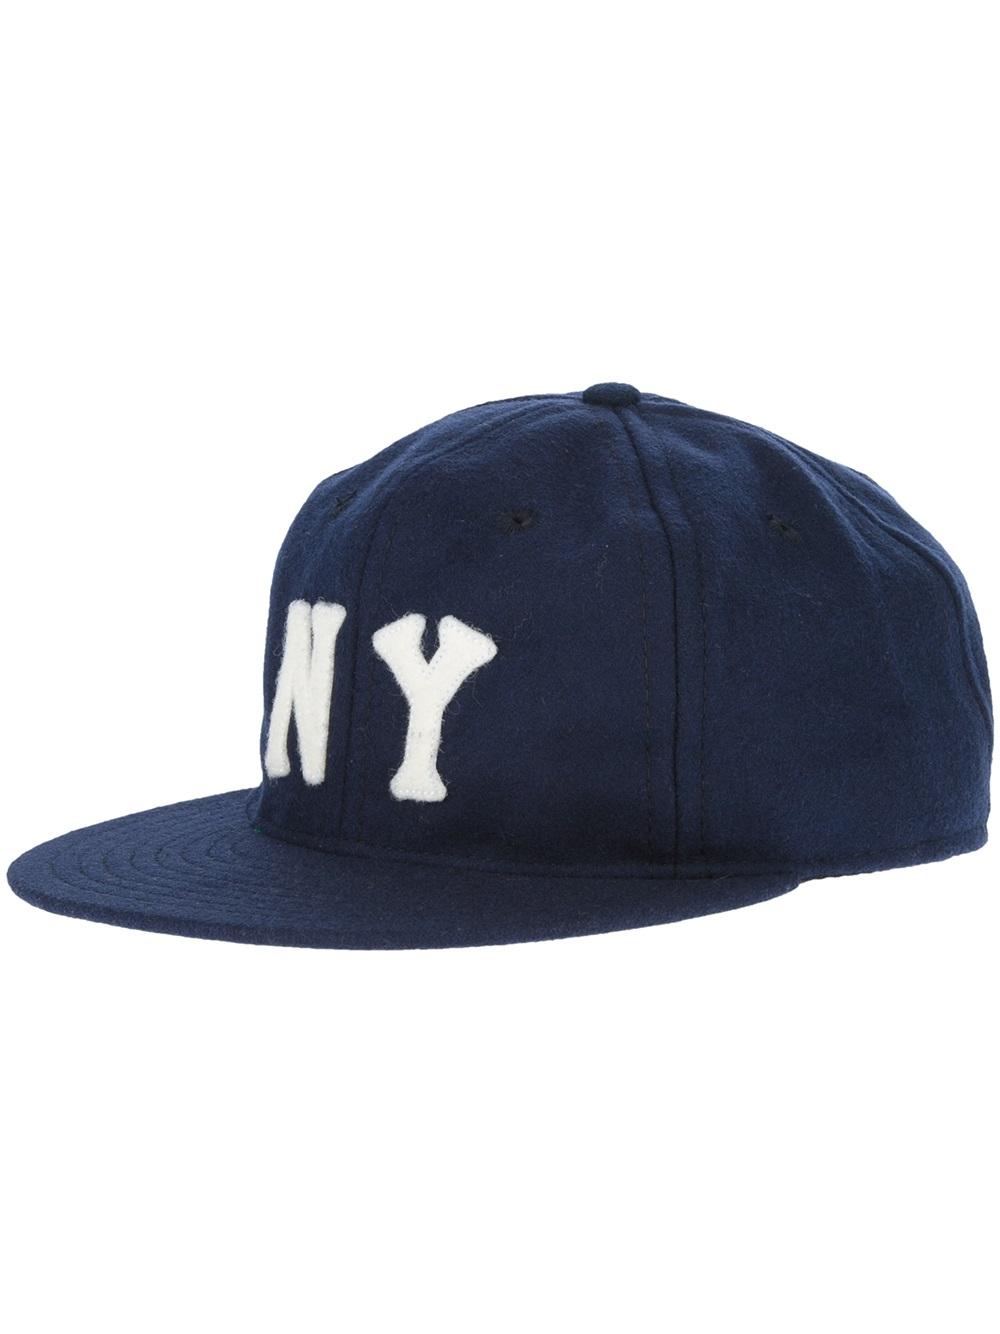 Ebbets Field Flannels 'new York Black Yankees 1936' Ballcap - Zoo Fashions - Farfetch.com